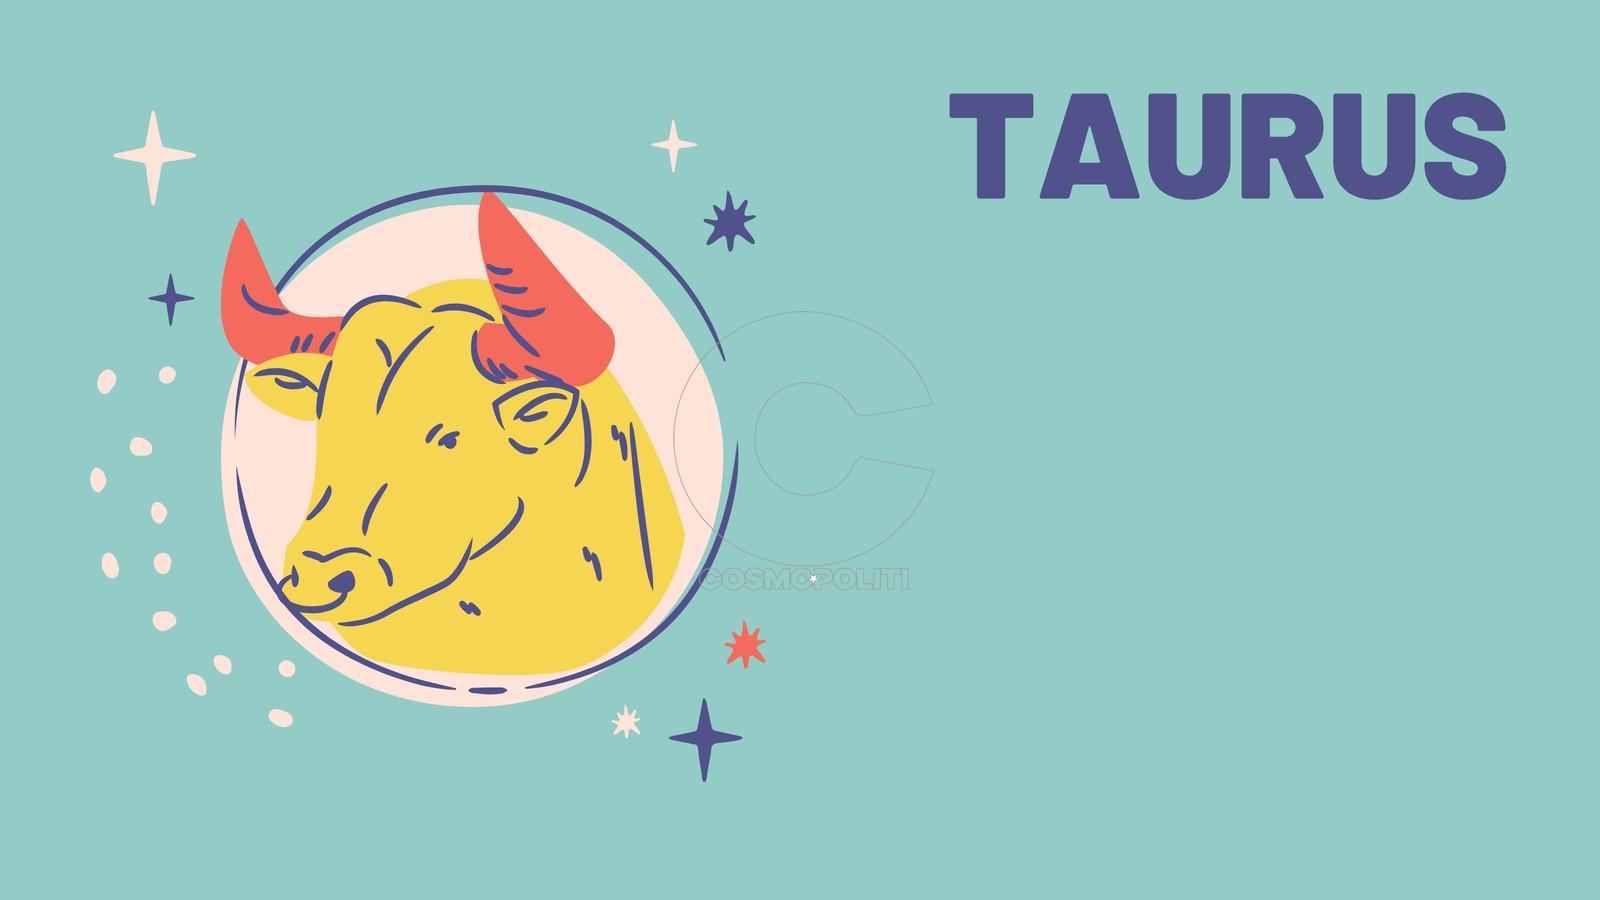 canva-yellow-green-and-blue-cute-taurus-zodiac-sign-zoom-virtual-background-dJ1WKPpEi0Q